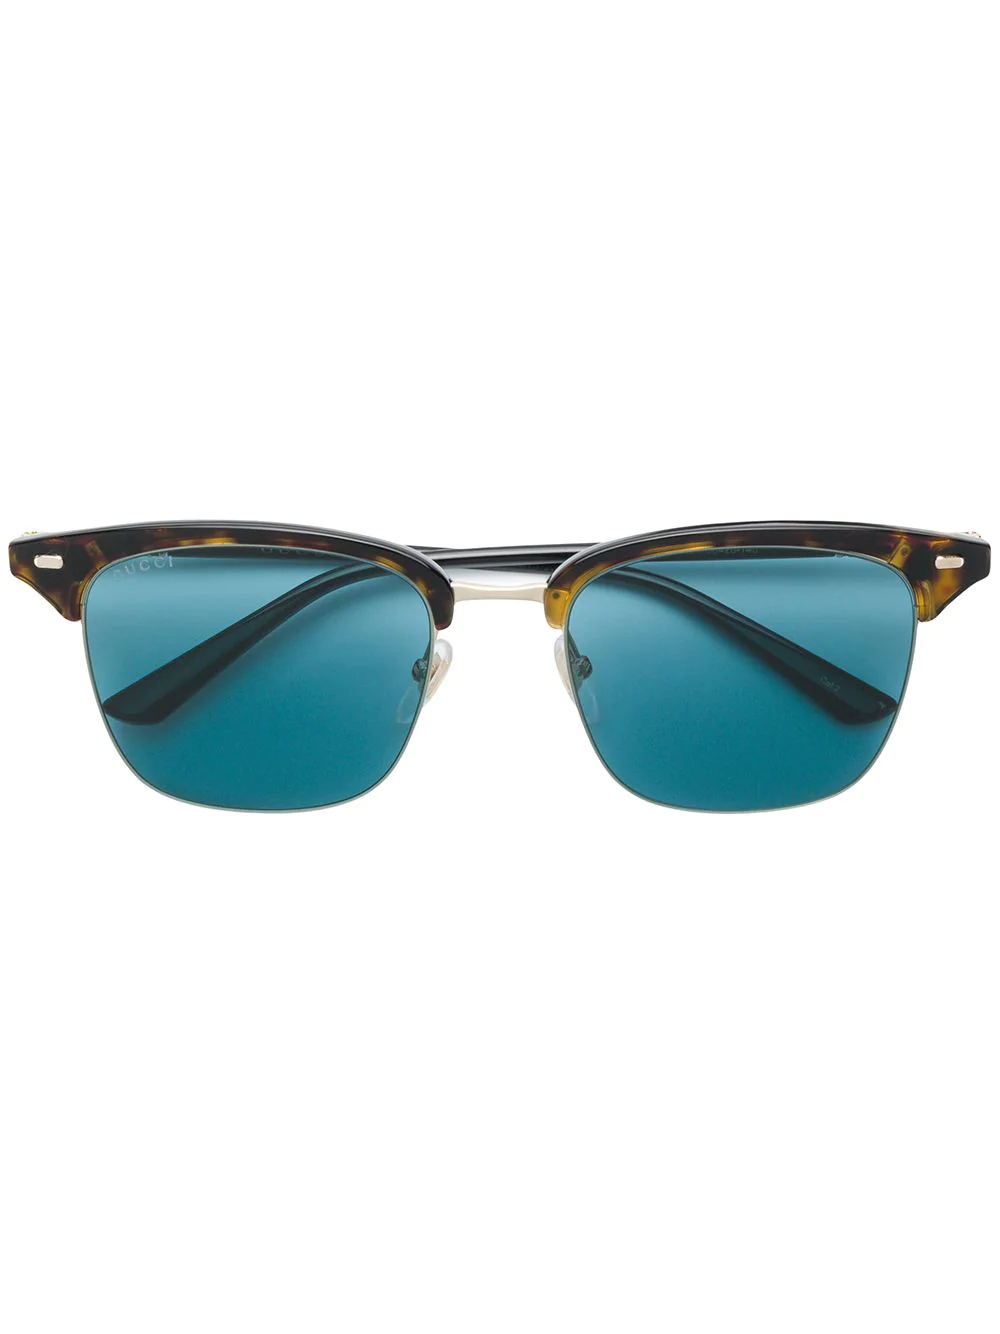 GUCCI | солнцезащитные очки 'Clubmaster' | Clouty